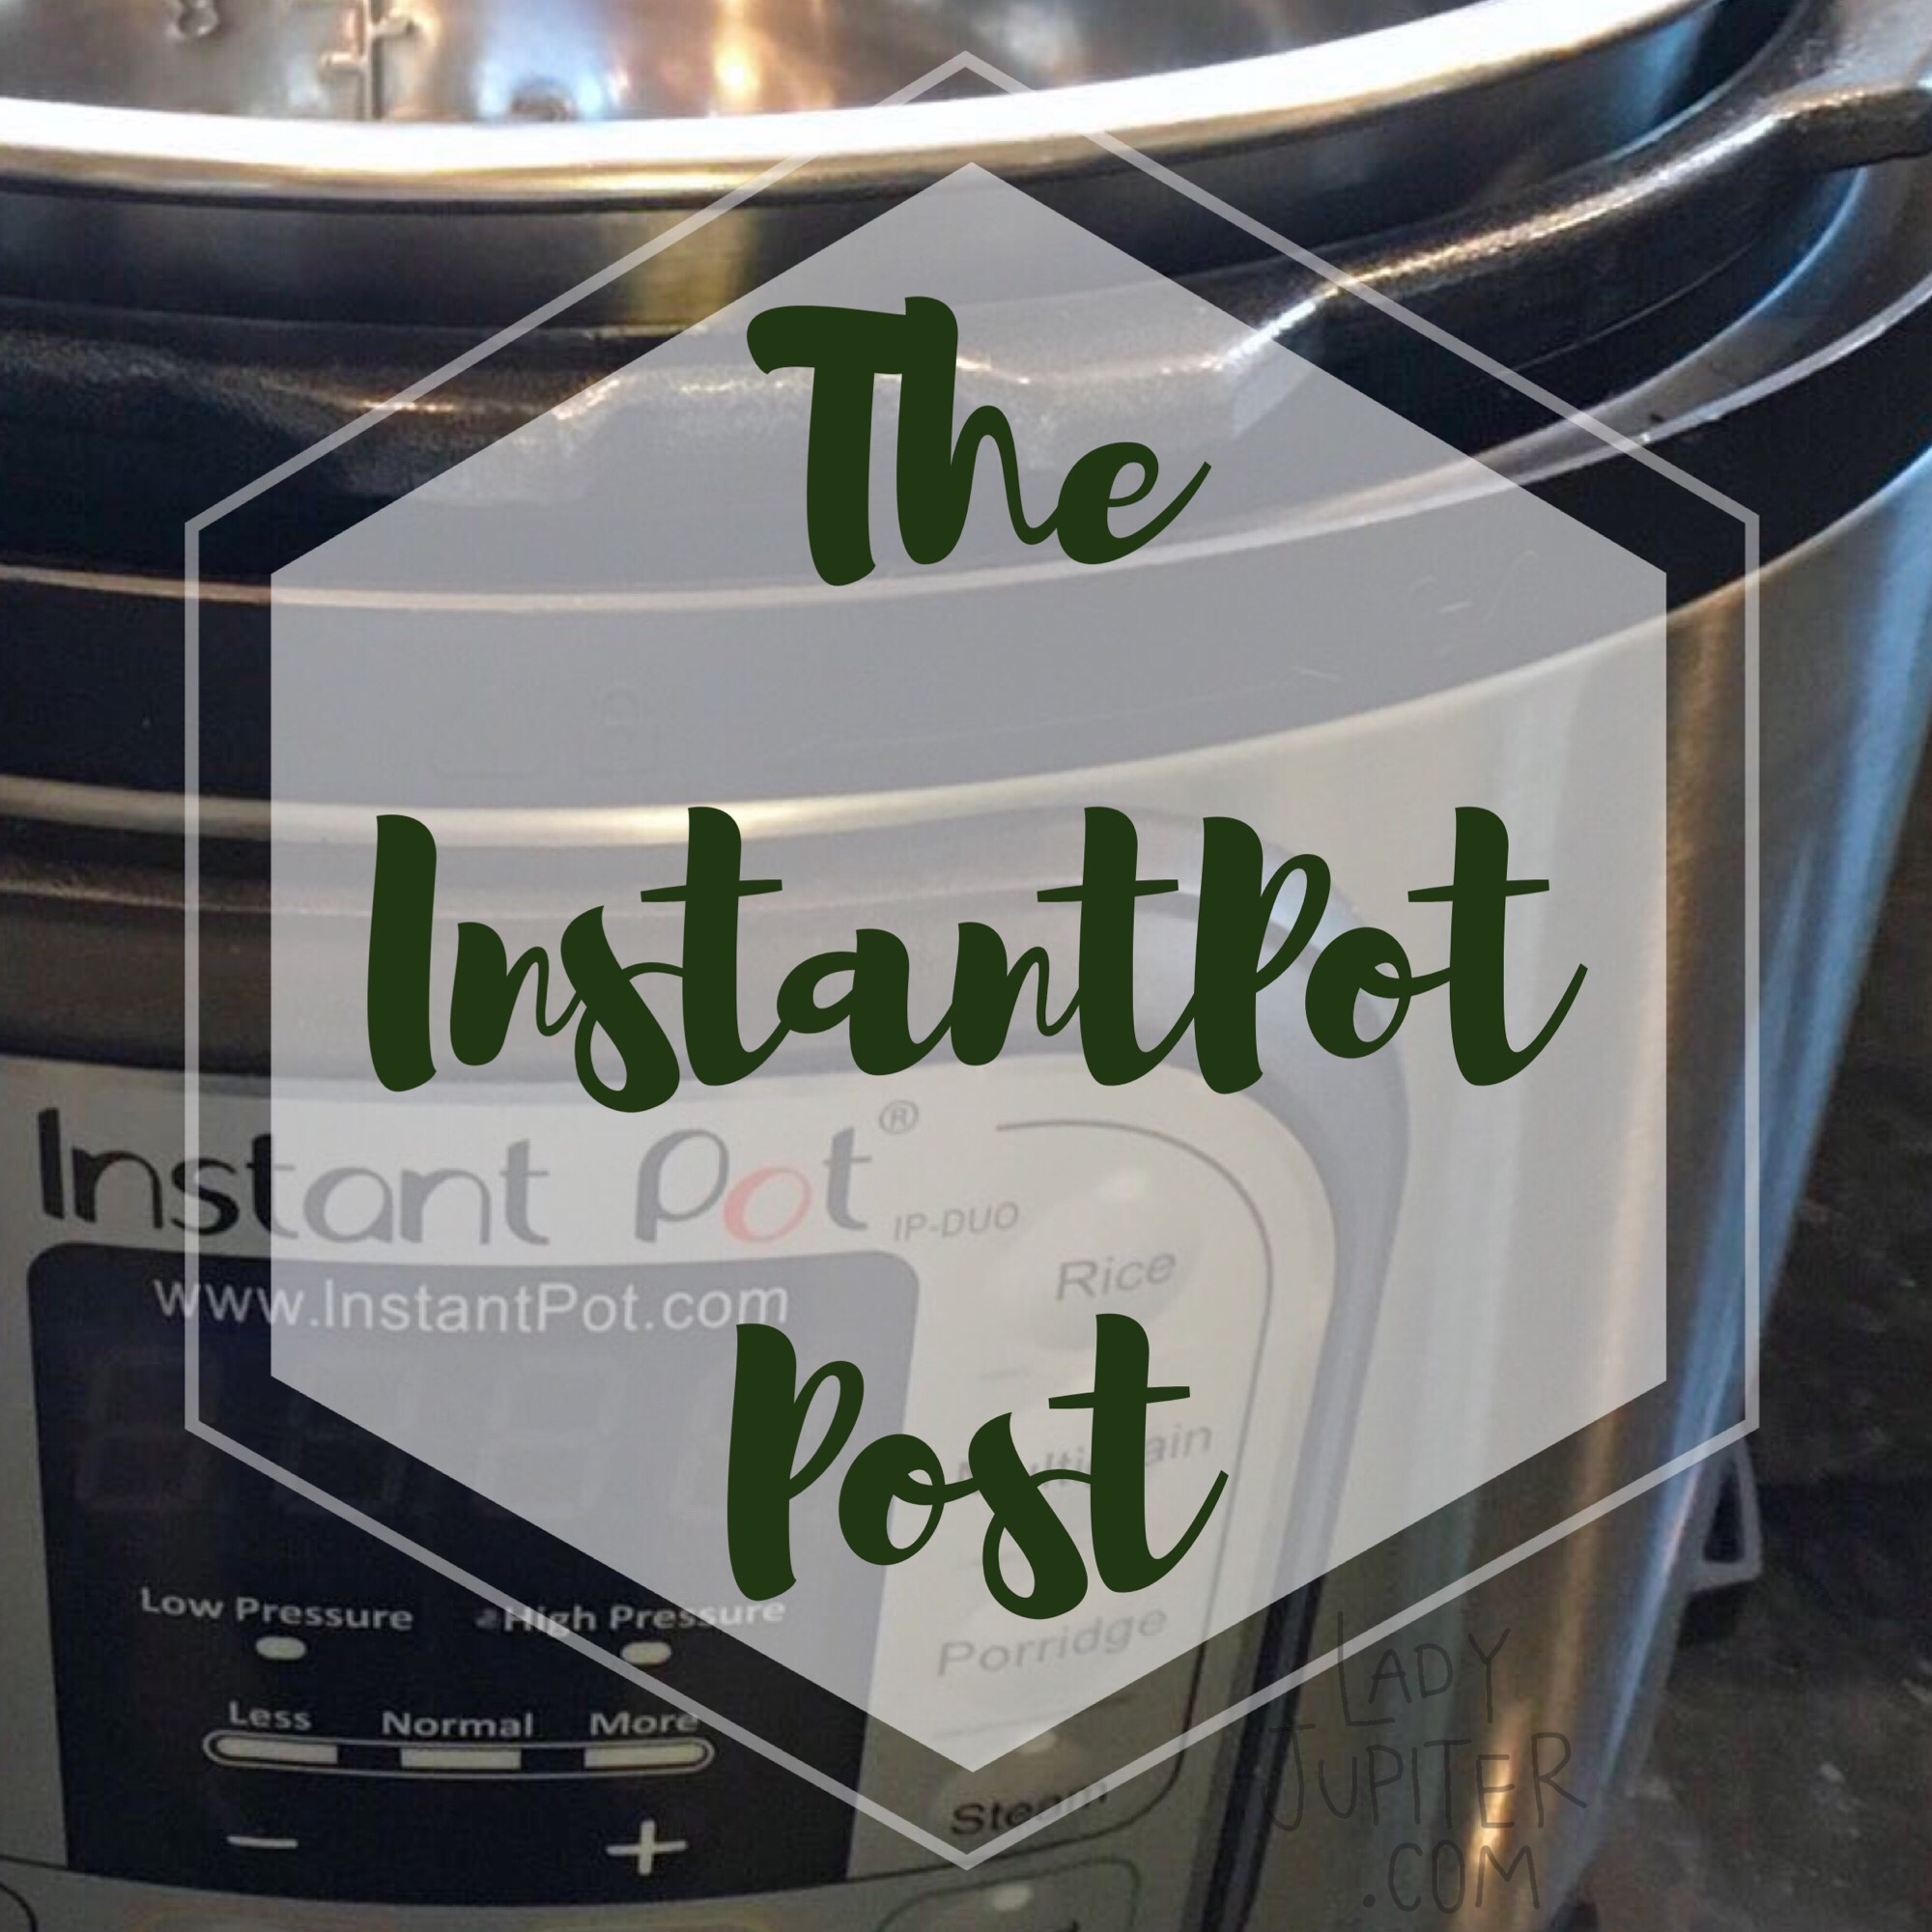 The InstantPot Post -why I love it, plus bonus recipe #InstantPot #chickenrice #goodfood